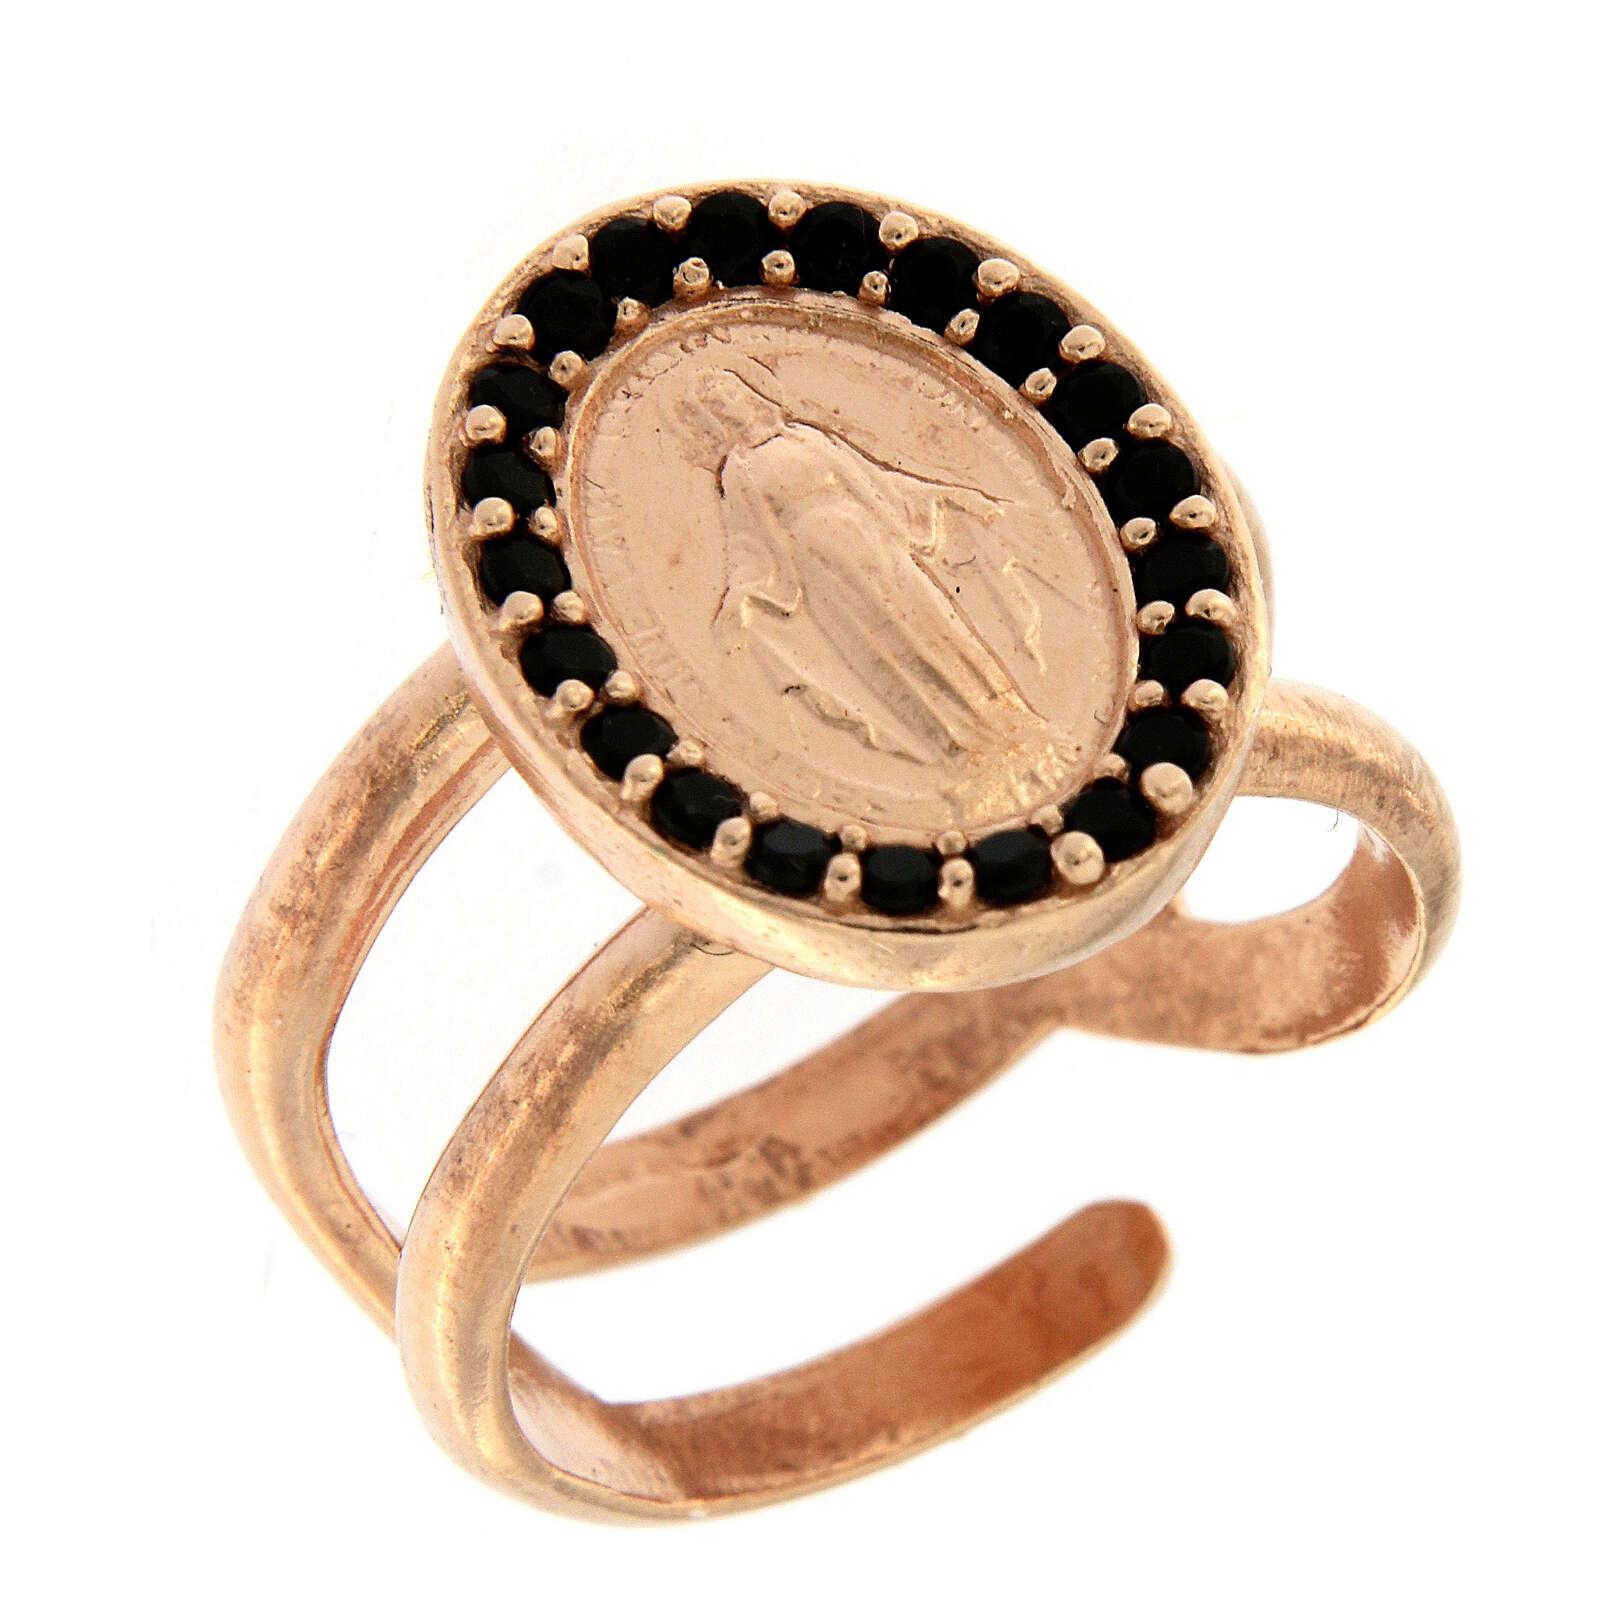 Anillo ajustable plata 925 rosada Medalla Milagrosa zircones negros 3